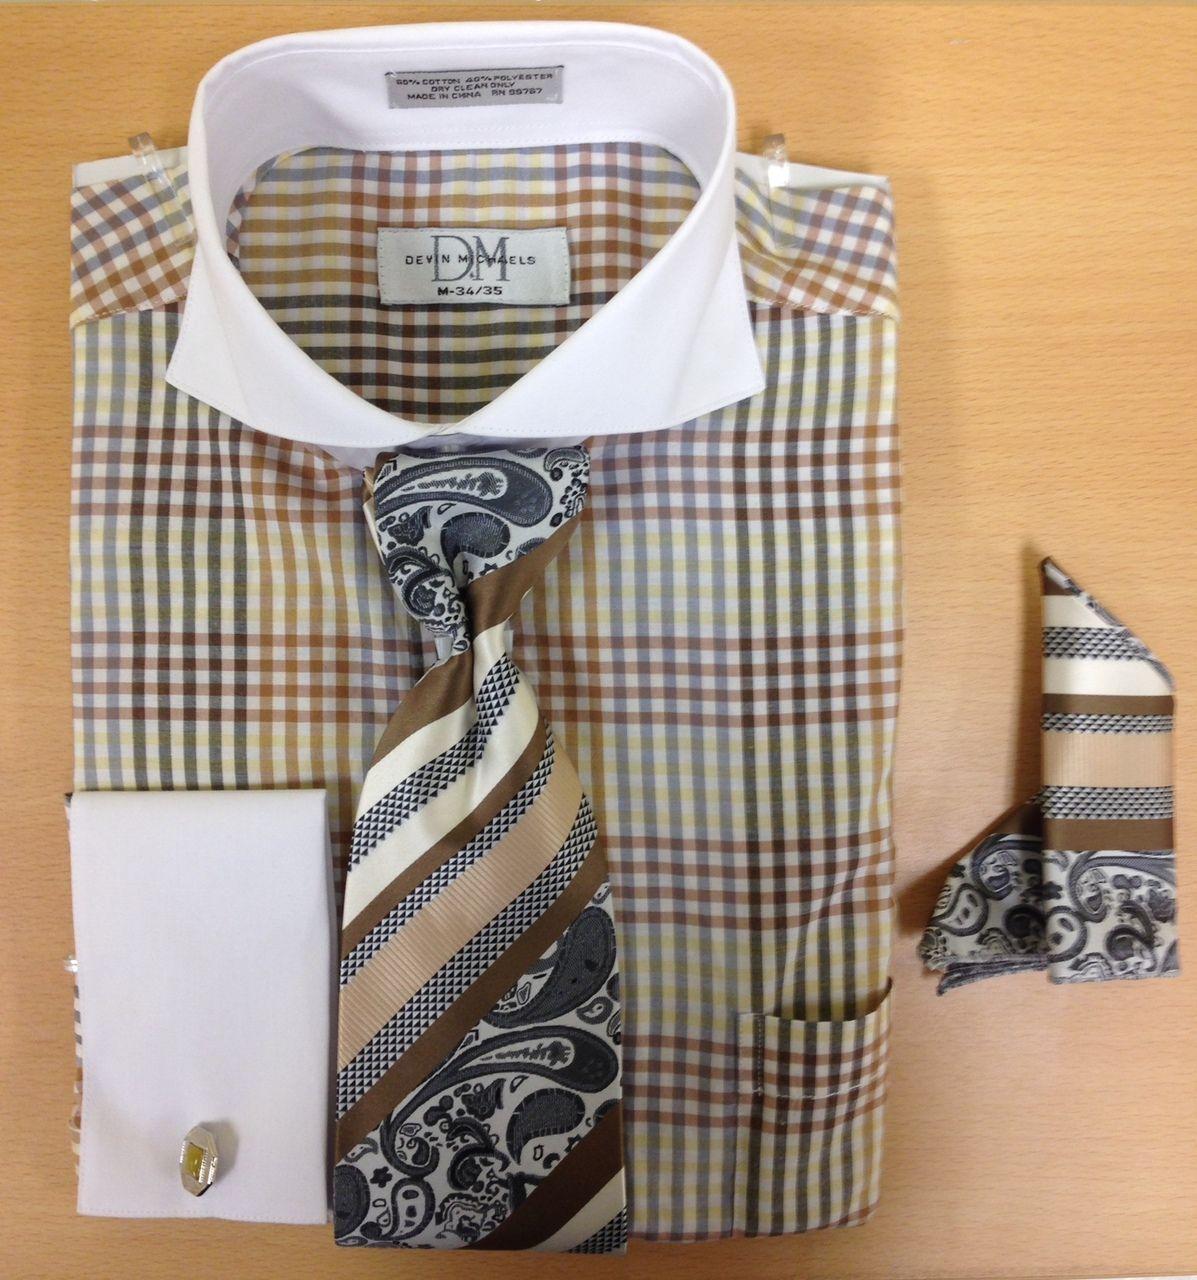 Men's Fashion Three-Tone Gingham Pattern Cufflink Dress Shirt Set - Brown/Silver/Tan